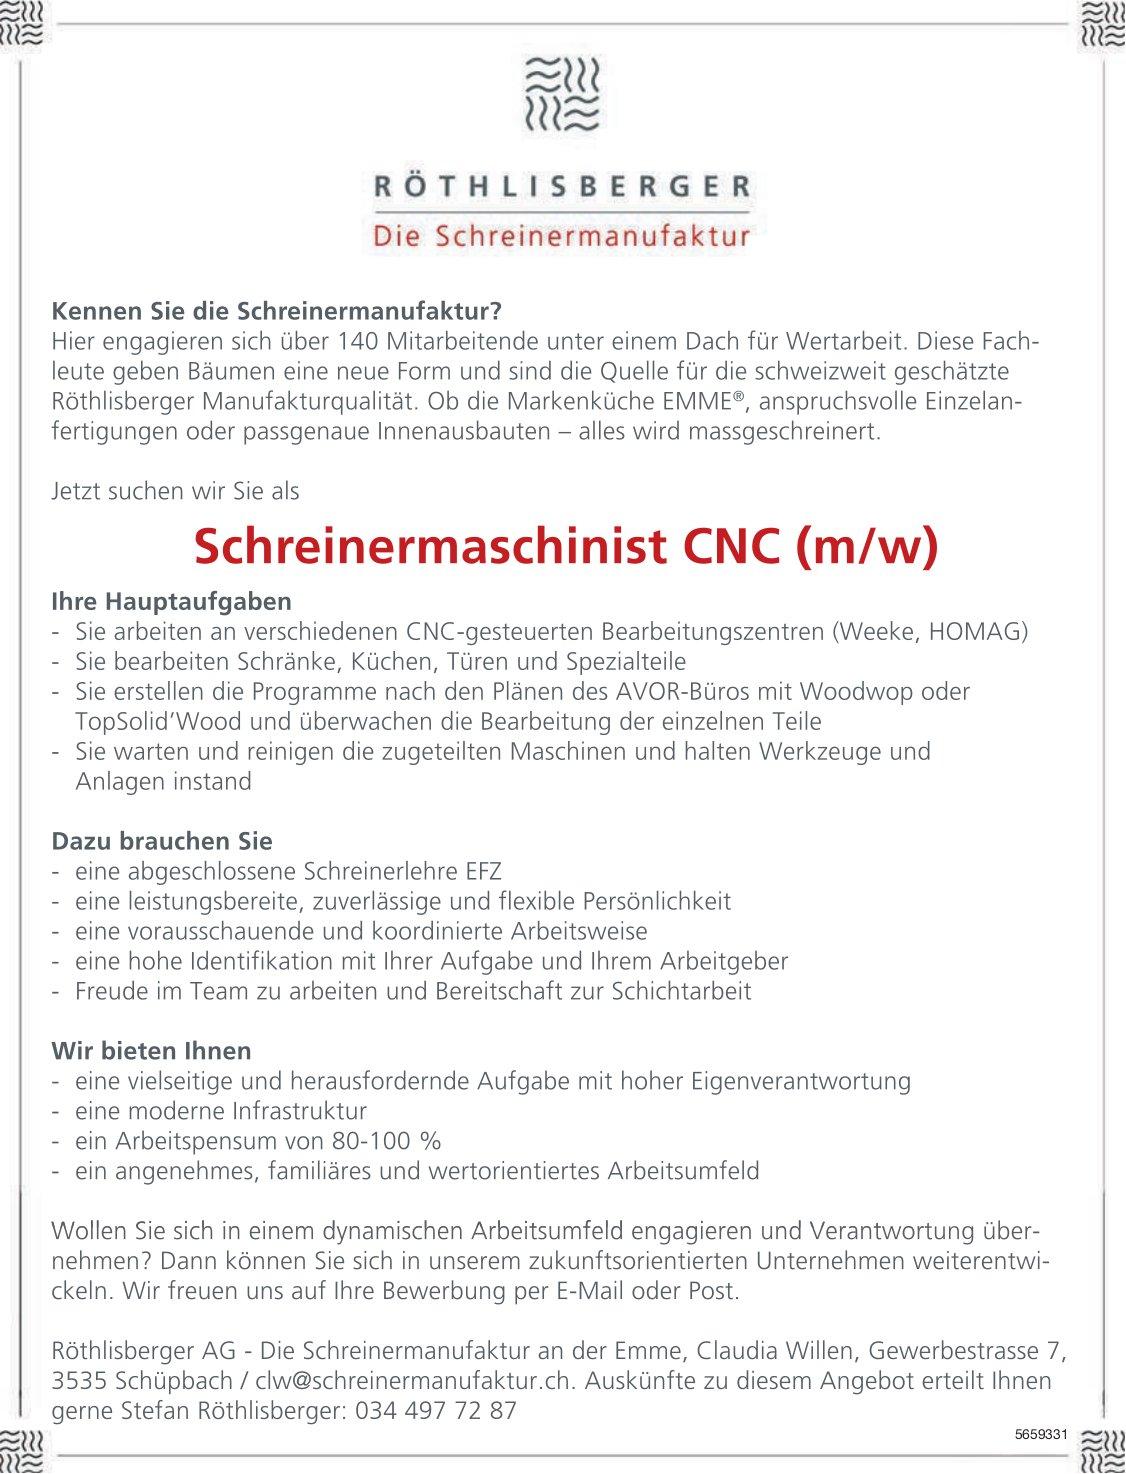 Schreinermaschinist CNC (m/w), Röthlisberger AG, Schüpbach, gesucht